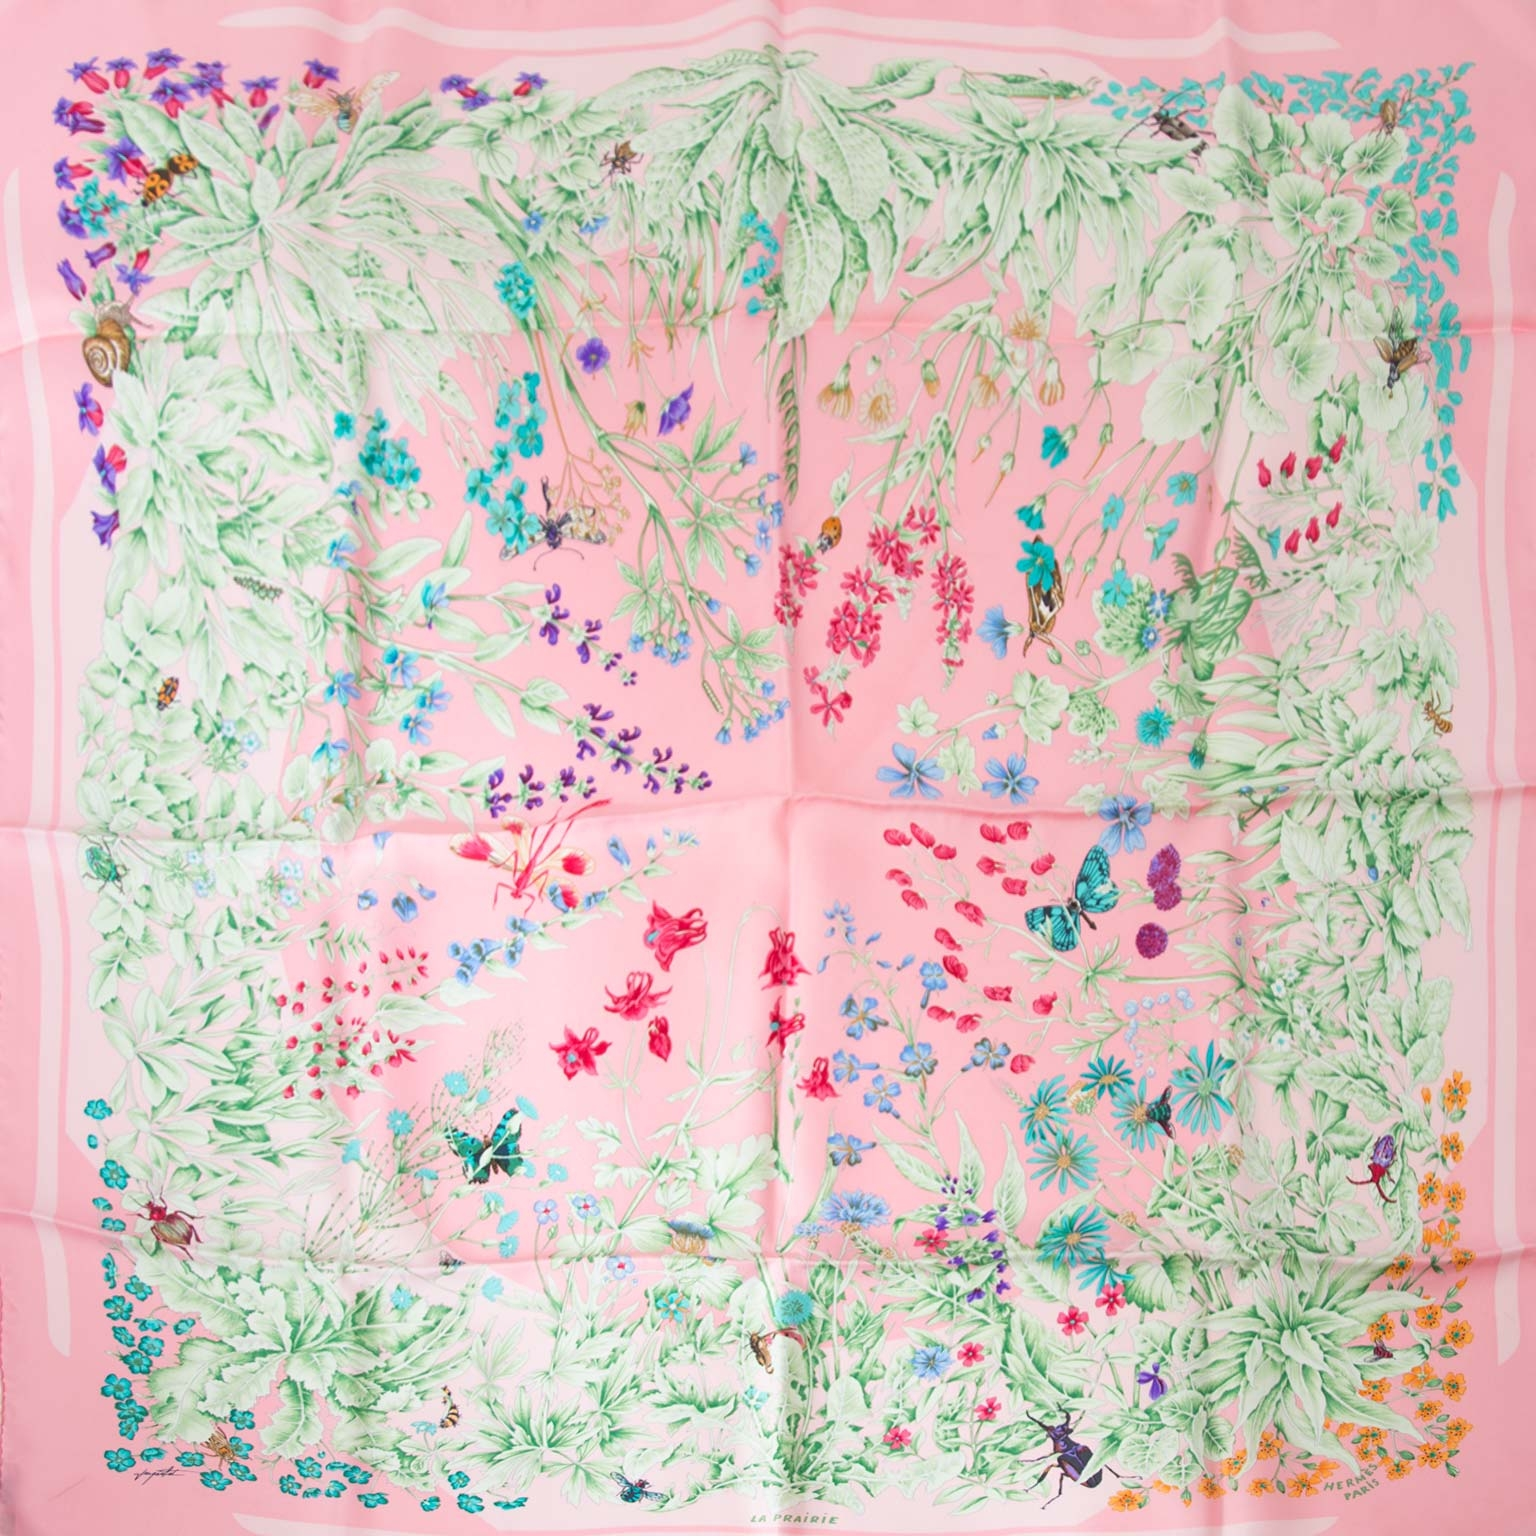 Hermès Paris Pink 'La Prairie' Silk Carré Scarf Buy authentic designer Hermes secondhand silk scarves at Labellov at the best price. Safe and secure shopping. Koop tweedehands authentieke Hermes sjaals bij designer webwinkel labellov.